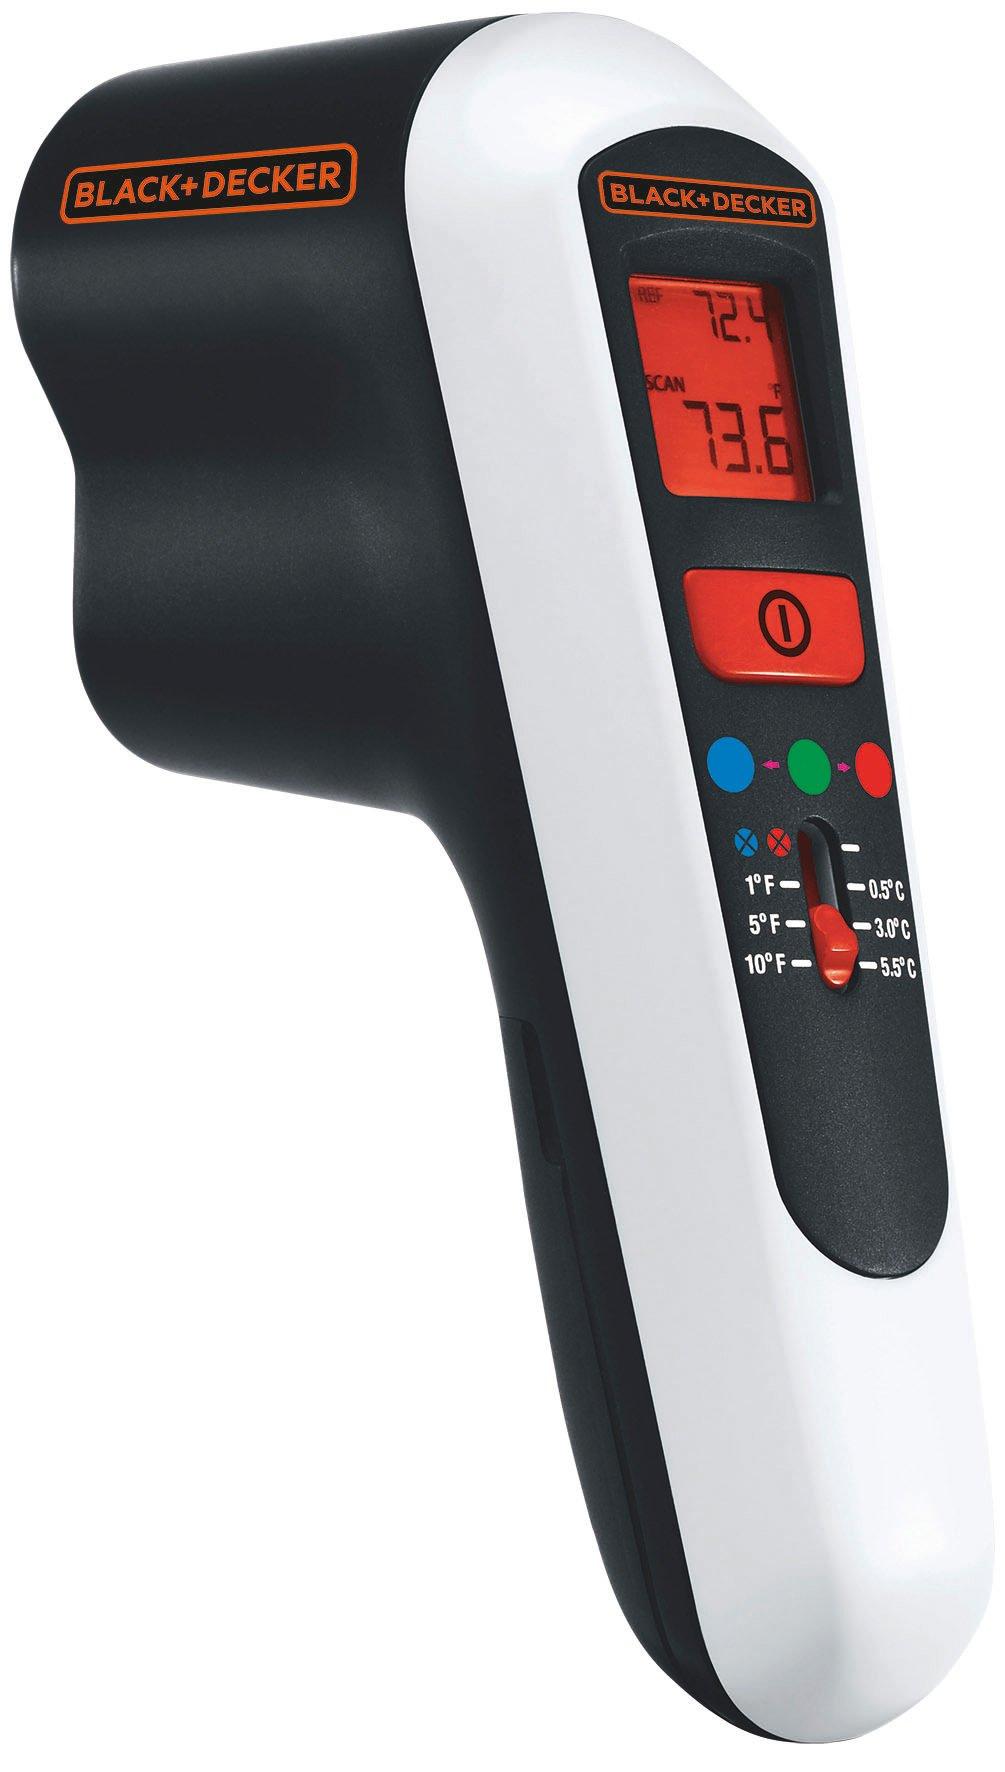 BLACK+DECKER TLD100 Thermal Leak Detector by BLACK+DECKER